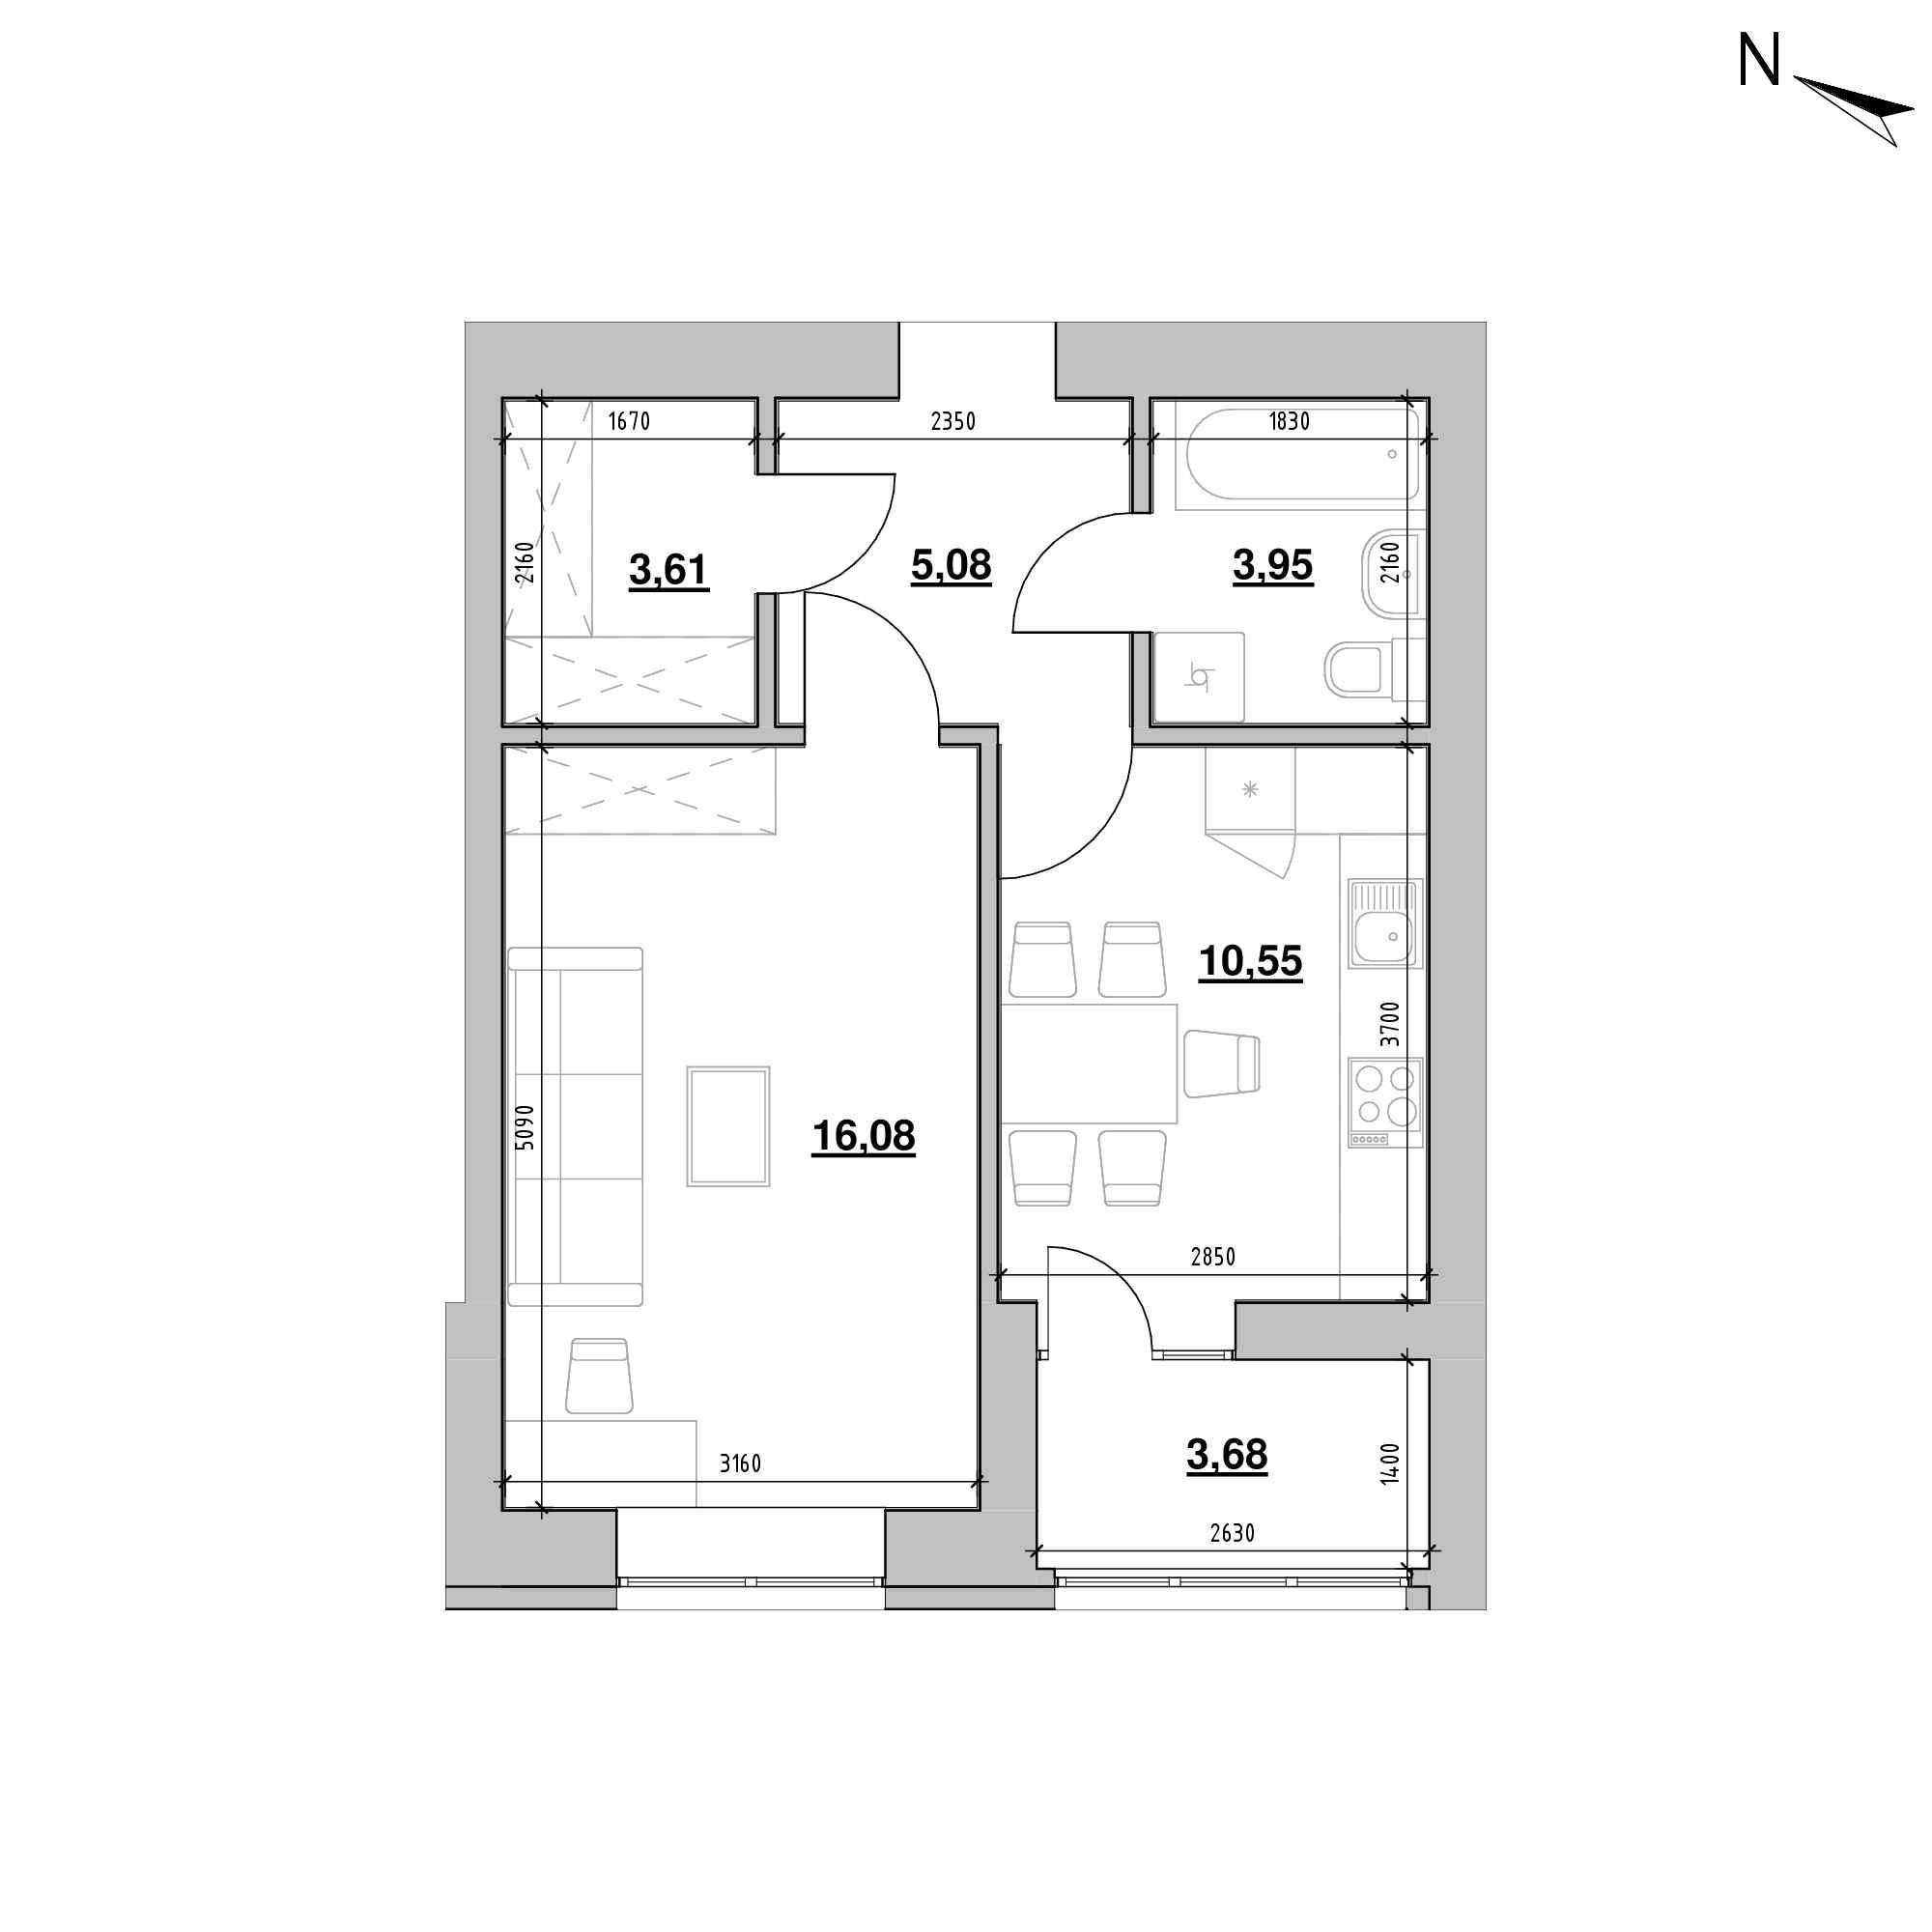 ЖК Шенген: планування 1-кімнатної квартири, №52, 42.95 м<sup>2</sup>